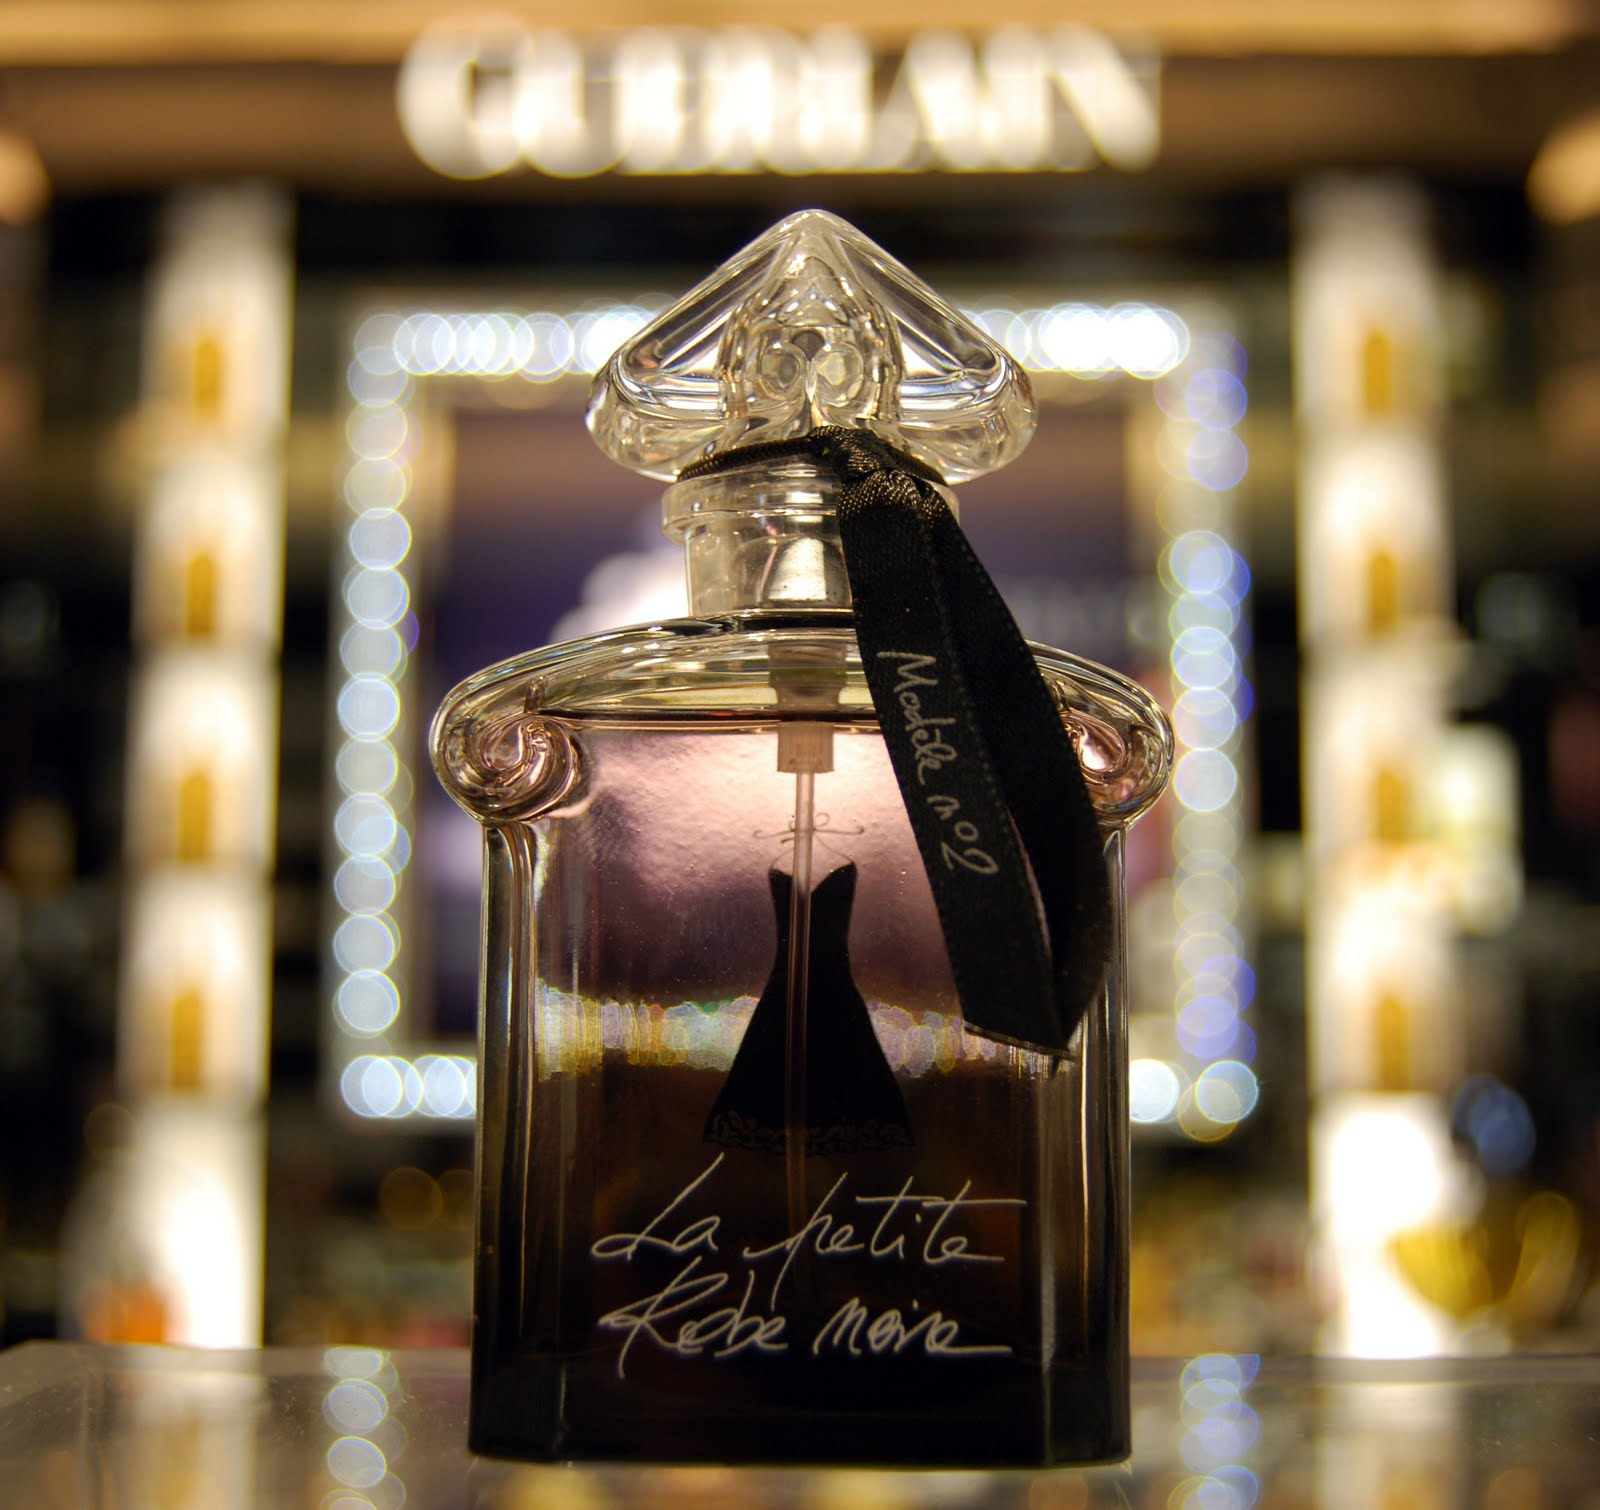 perfume shrine guerlain la petite robe noire no 2 fragrance review. Black Bedroom Furniture Sets. Home Design Ideas